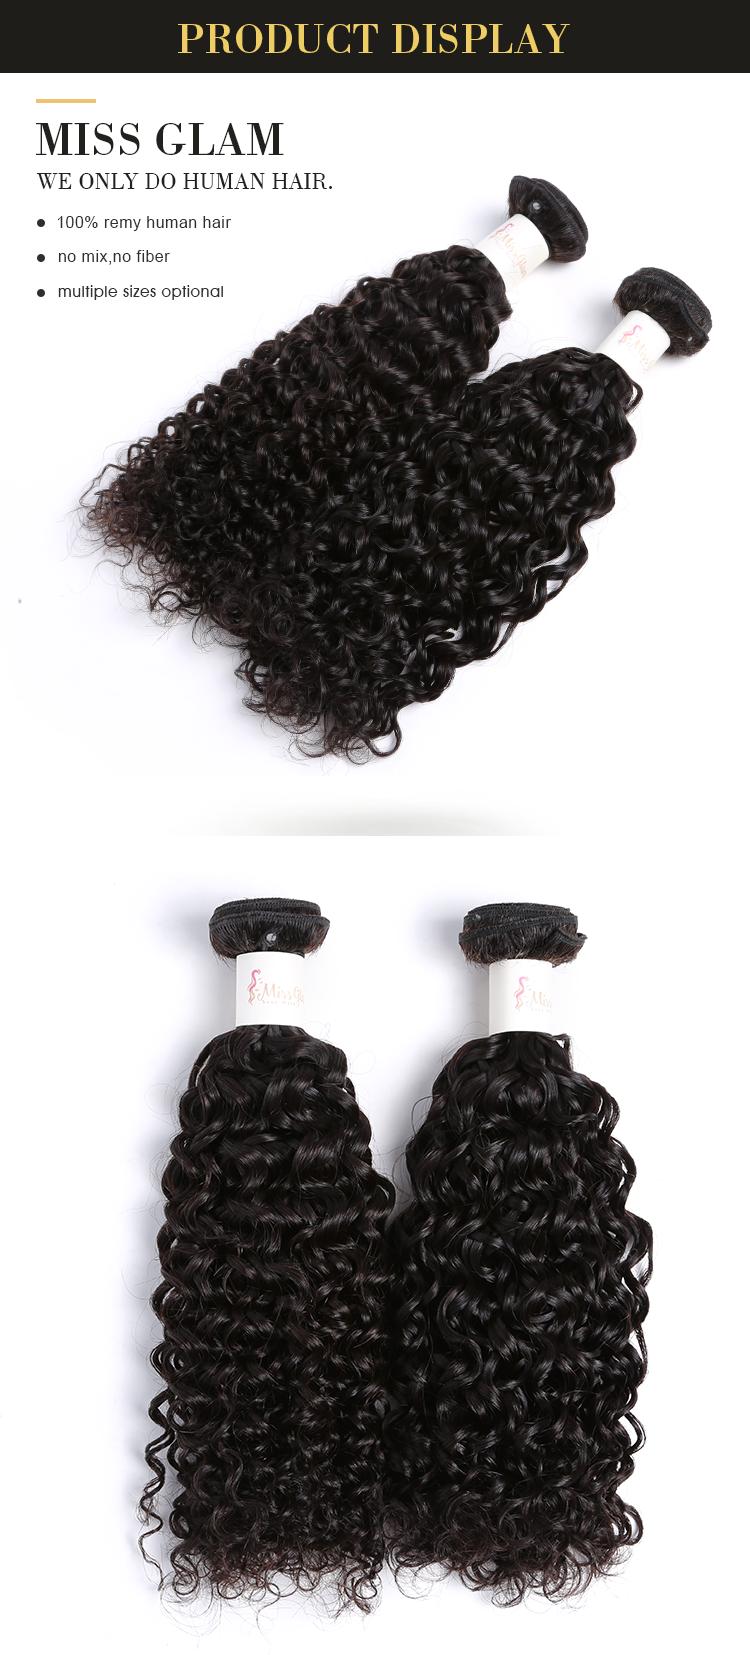 Guangzhou stella hair wholesaler raw virgin brazilian human hair jerry curly bundles for black woman